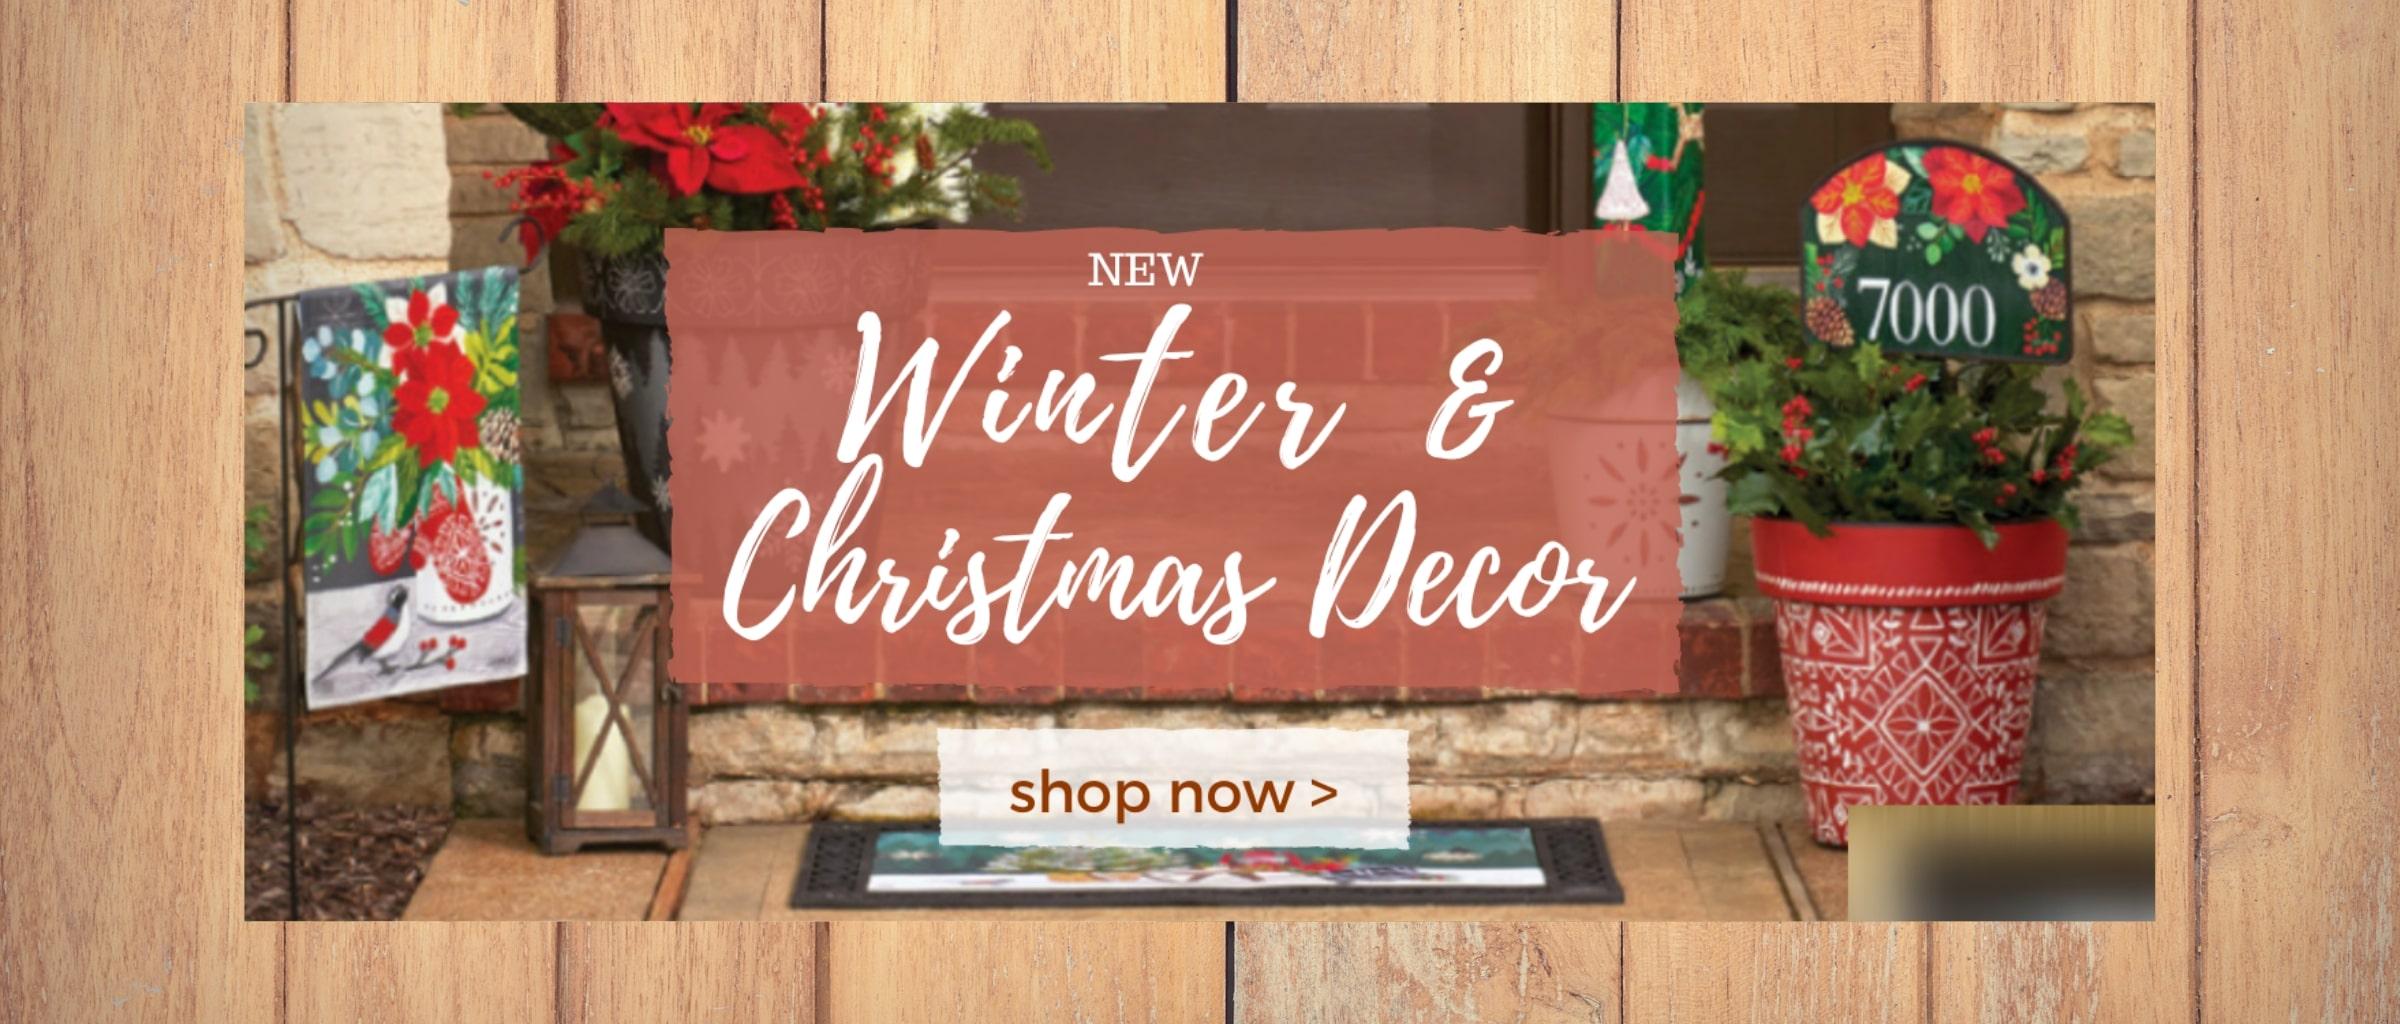 New Winter and Christmas Decor